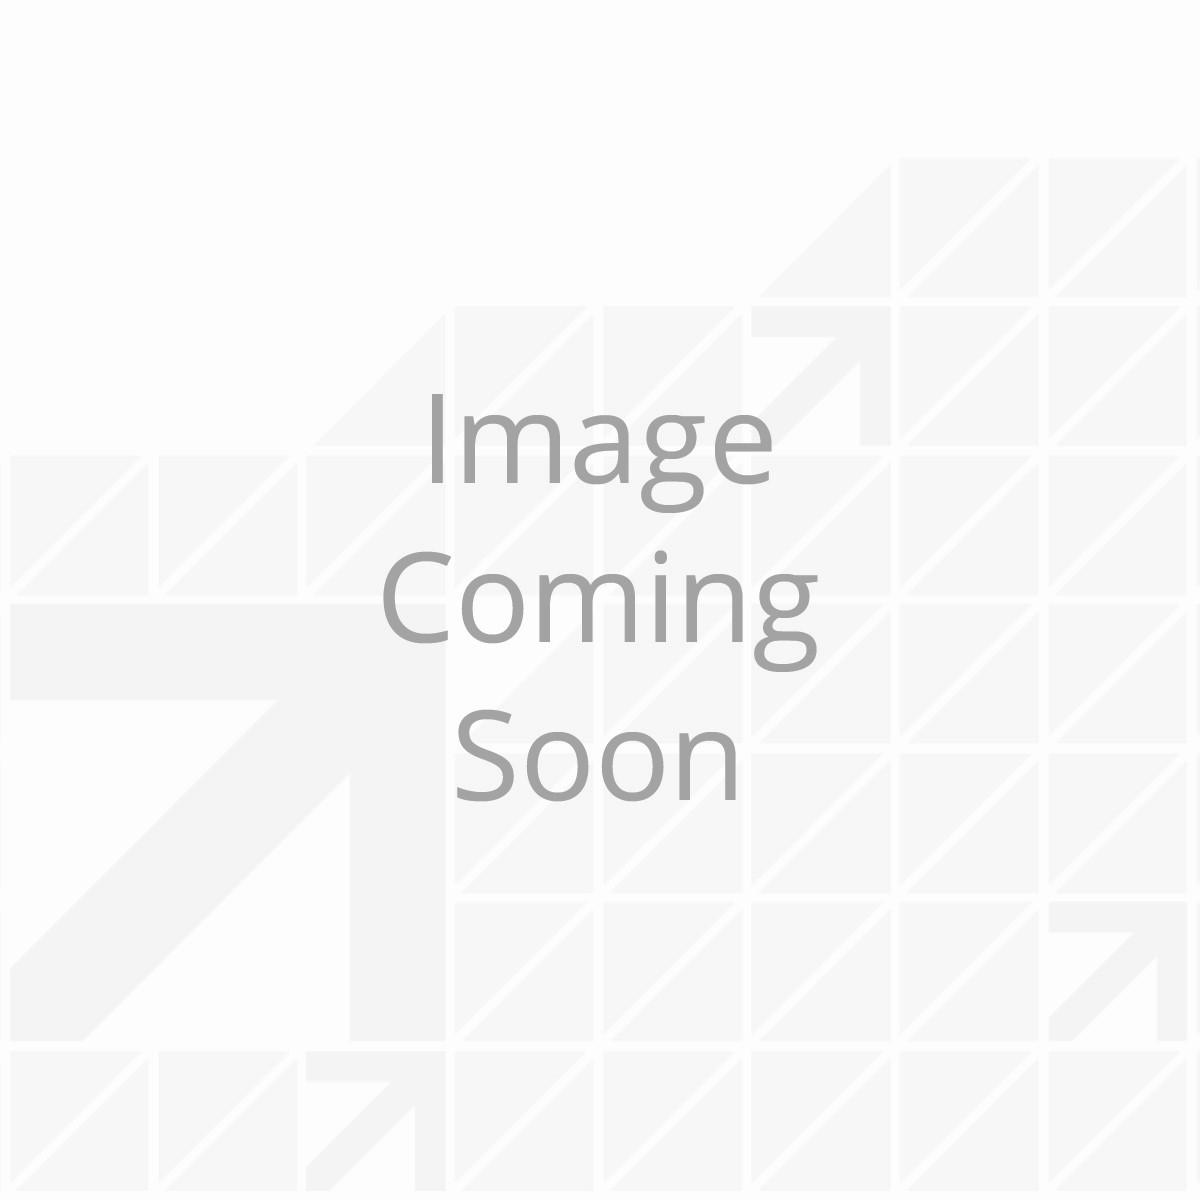 14' Power & Hybrid Awning Roller Assembly - Prepflex White Fade